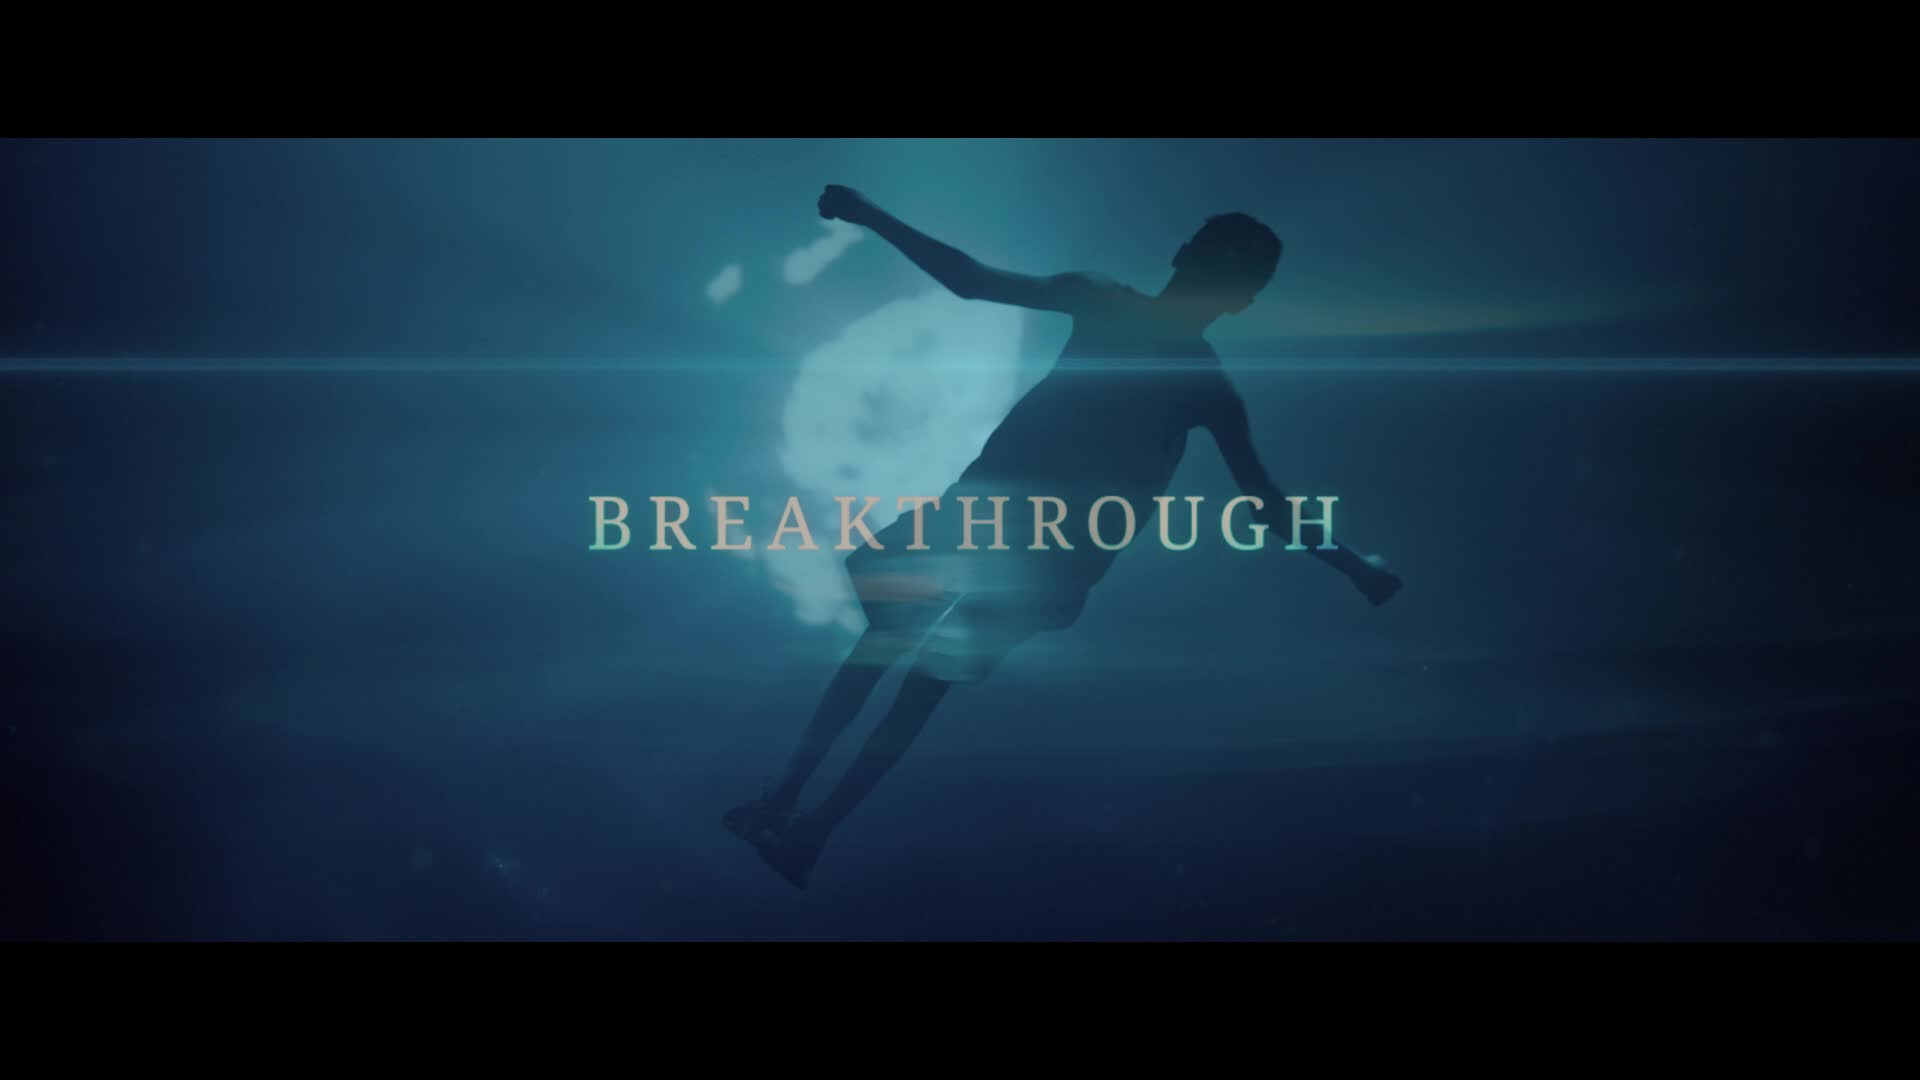 Breakthrough title